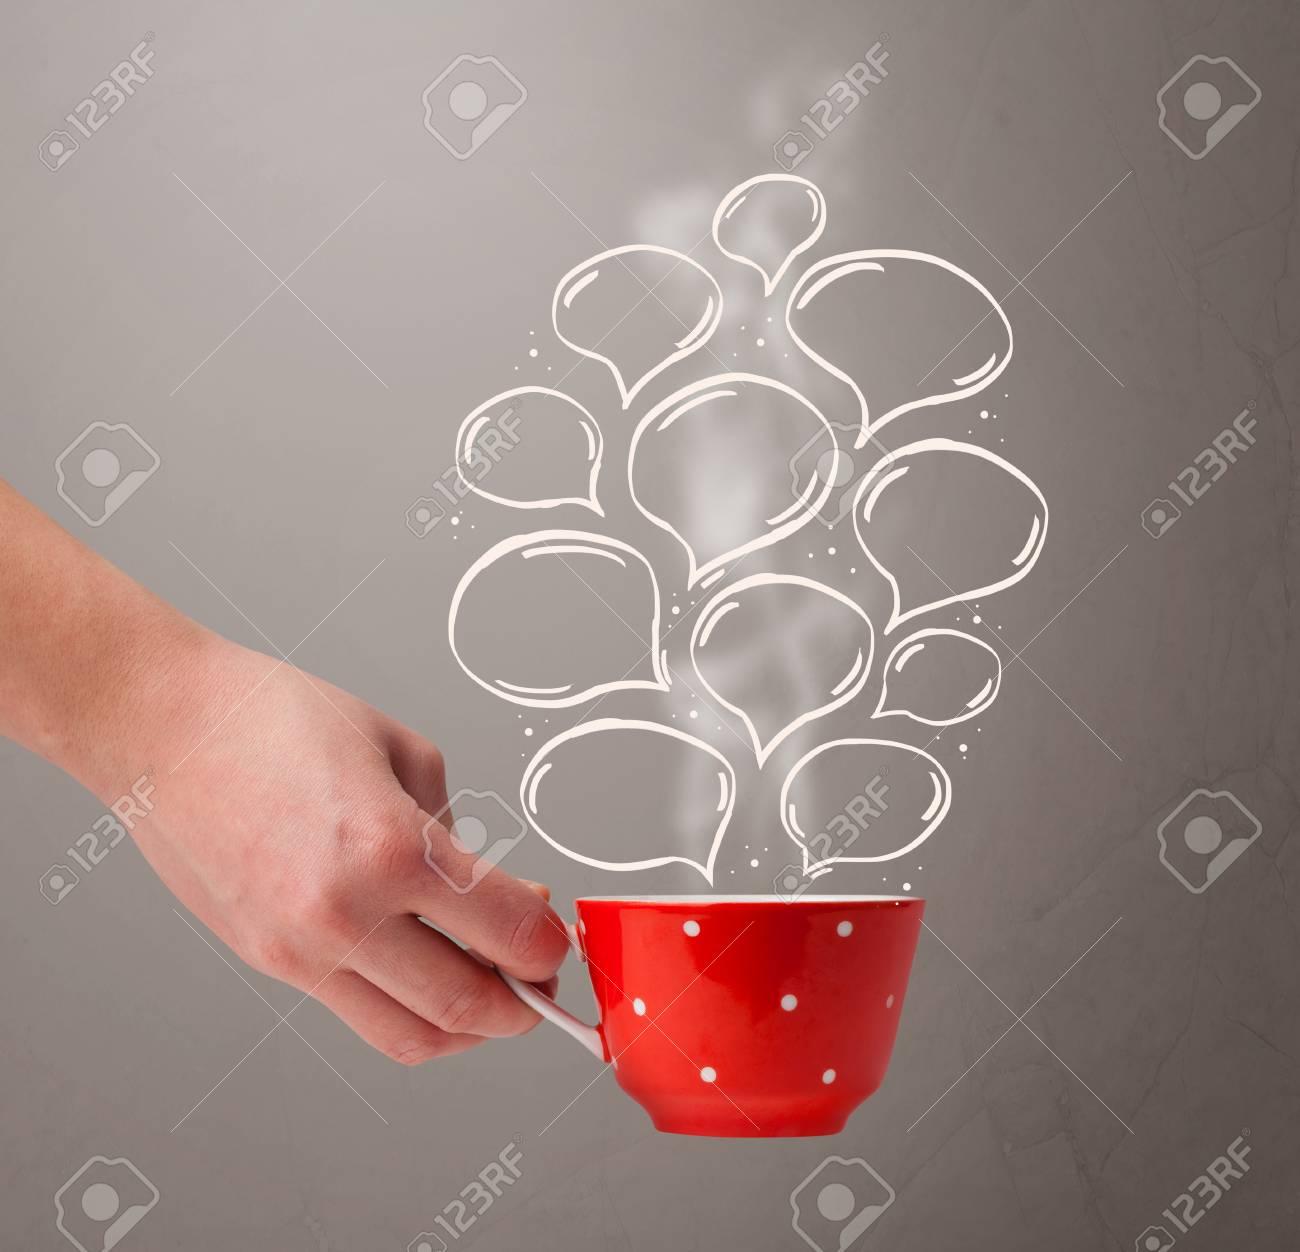 Coffee mug with hand drawn speech bubbles, close up Stock Photo - 24086362